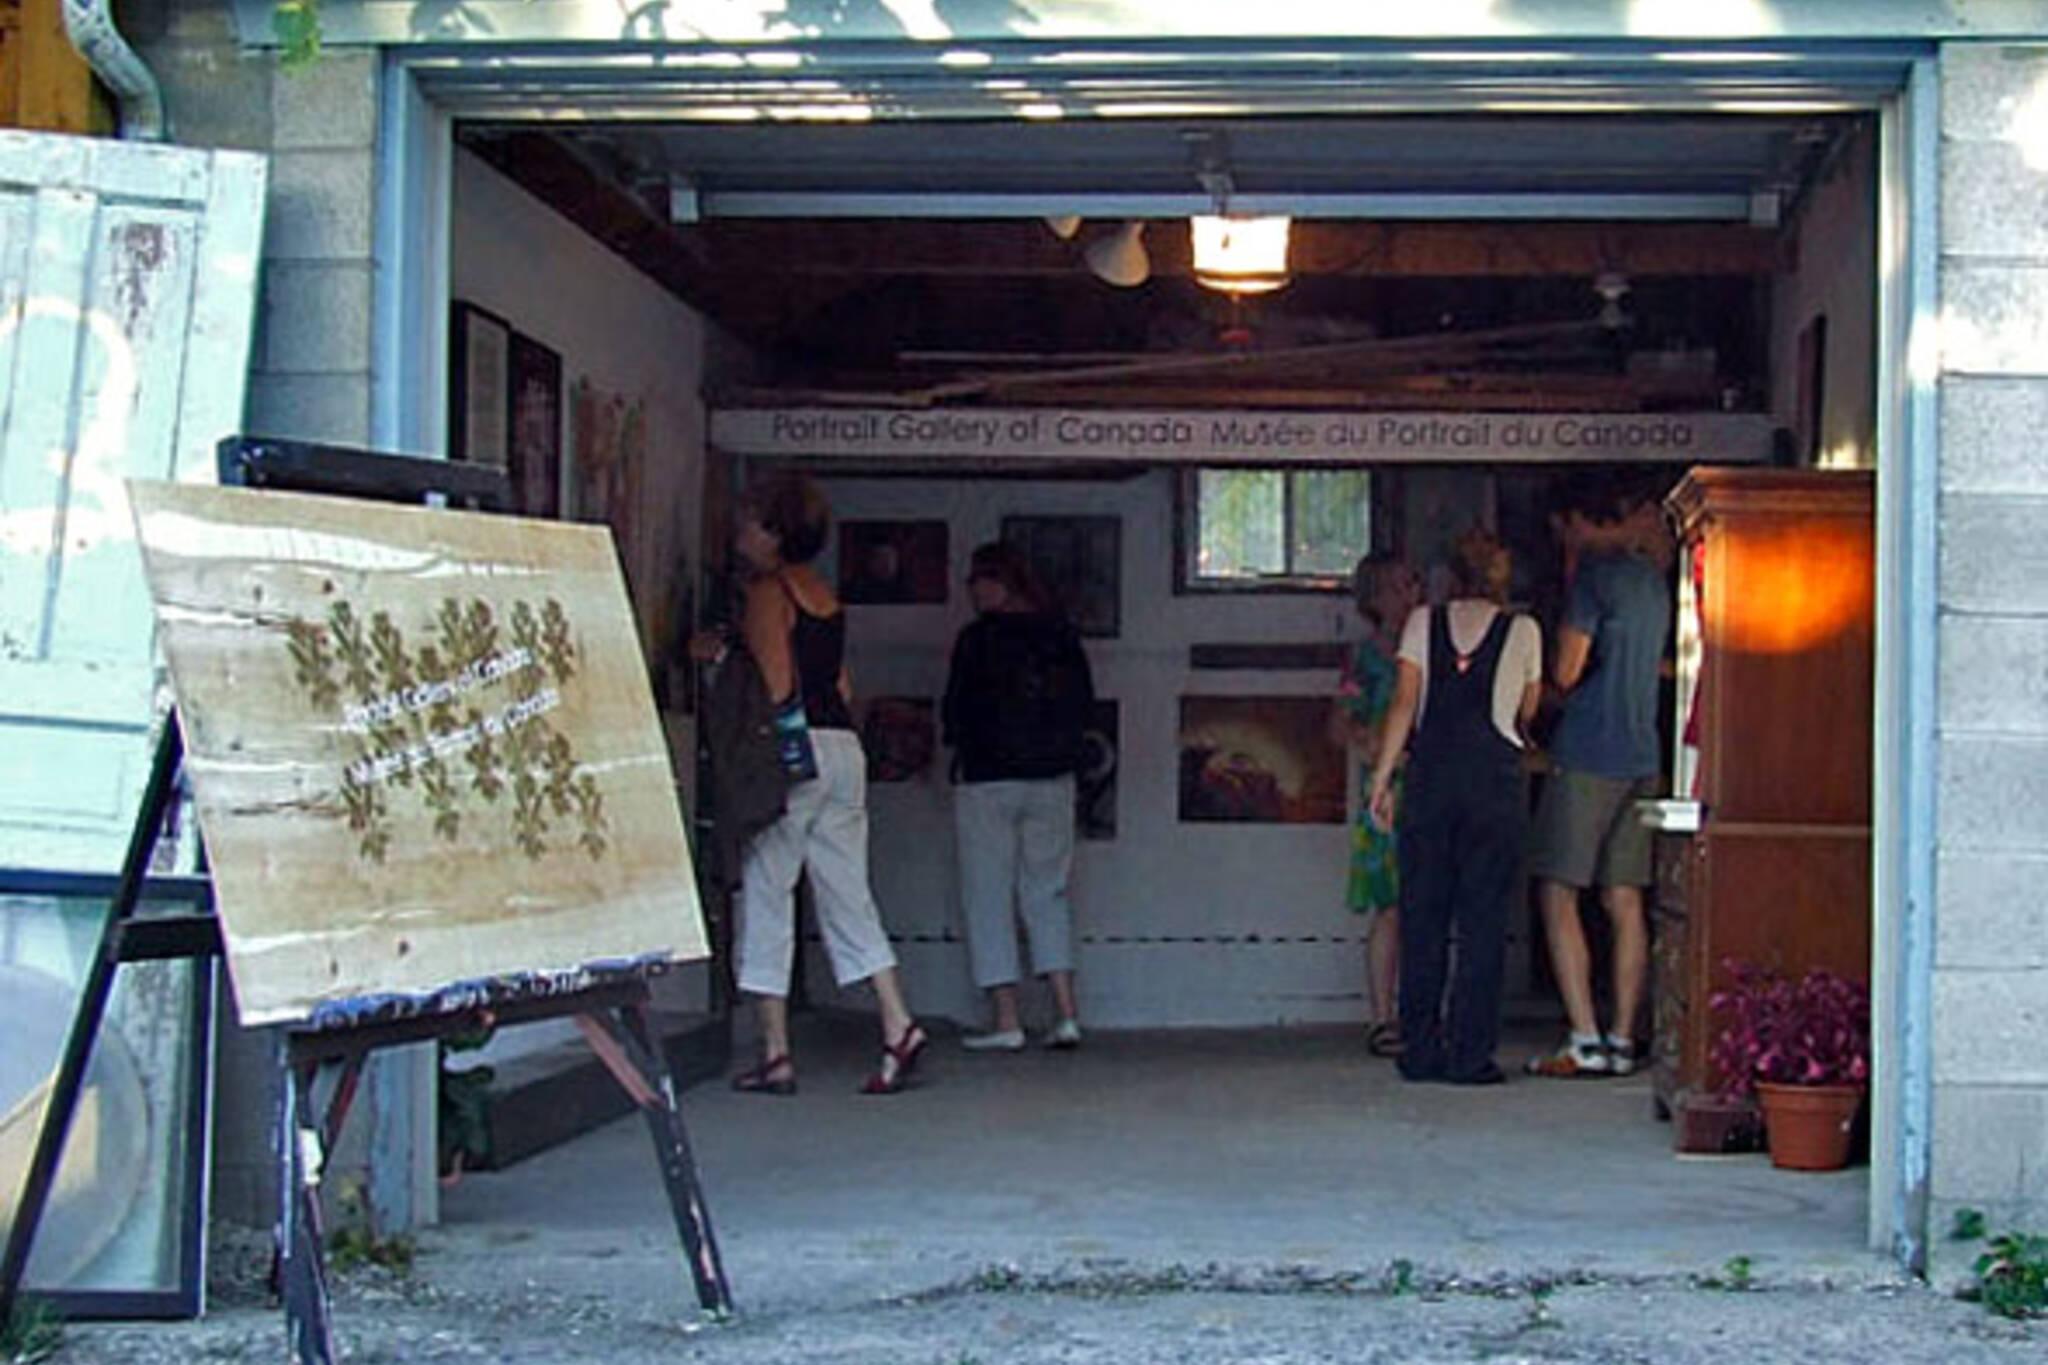 portrait gallery of canada in toronto.jpg